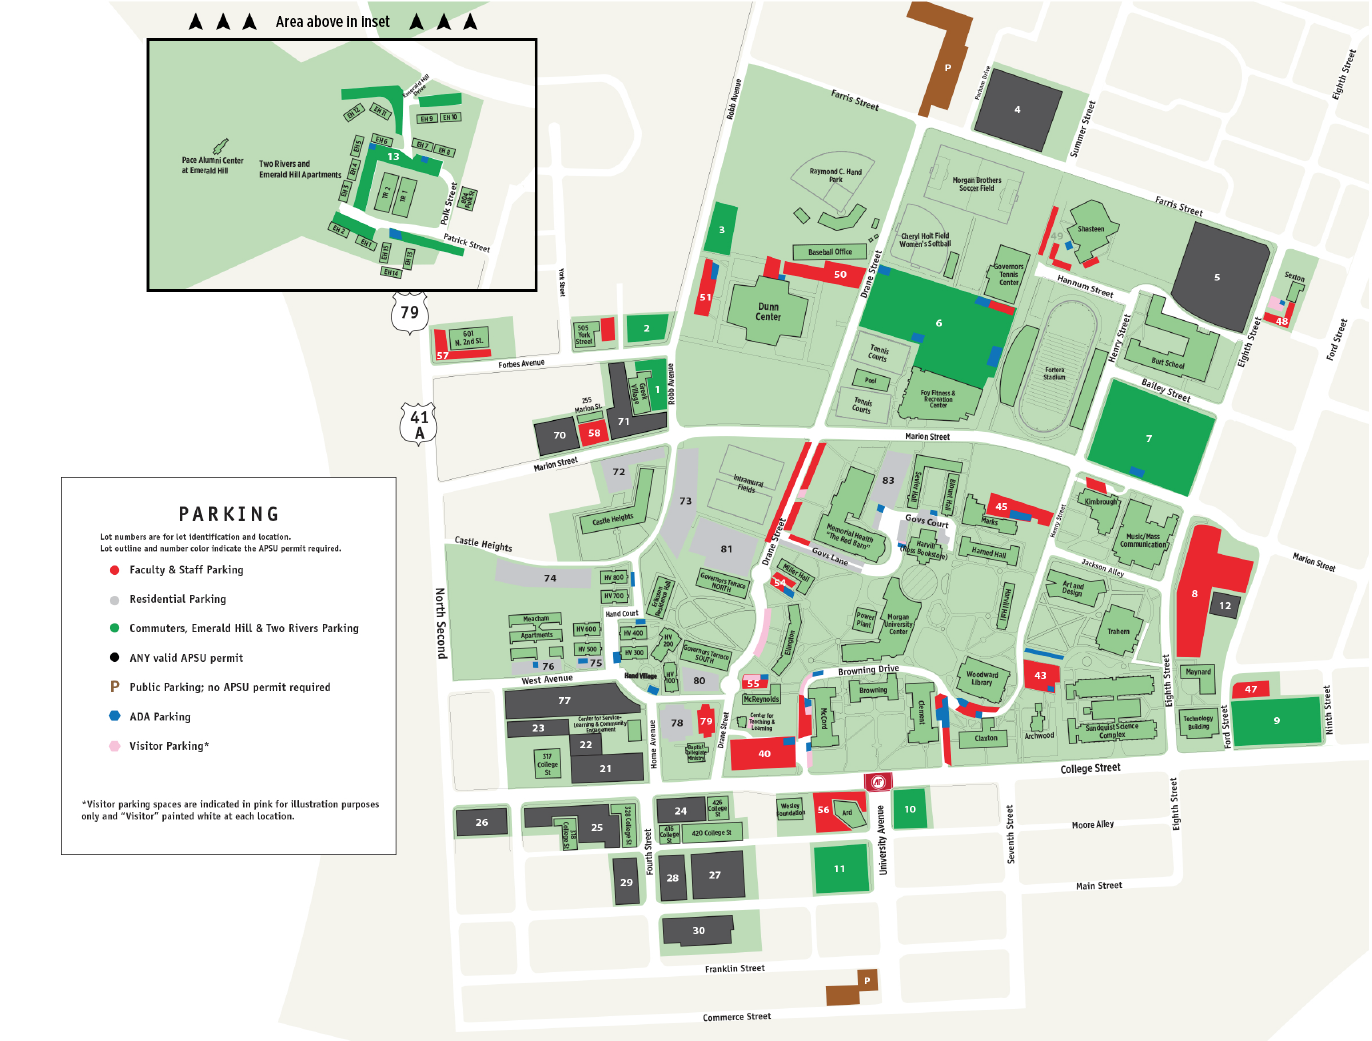 Apsu Campus Map Apsu Campus Map   compressportnederland Apsu Campus Map